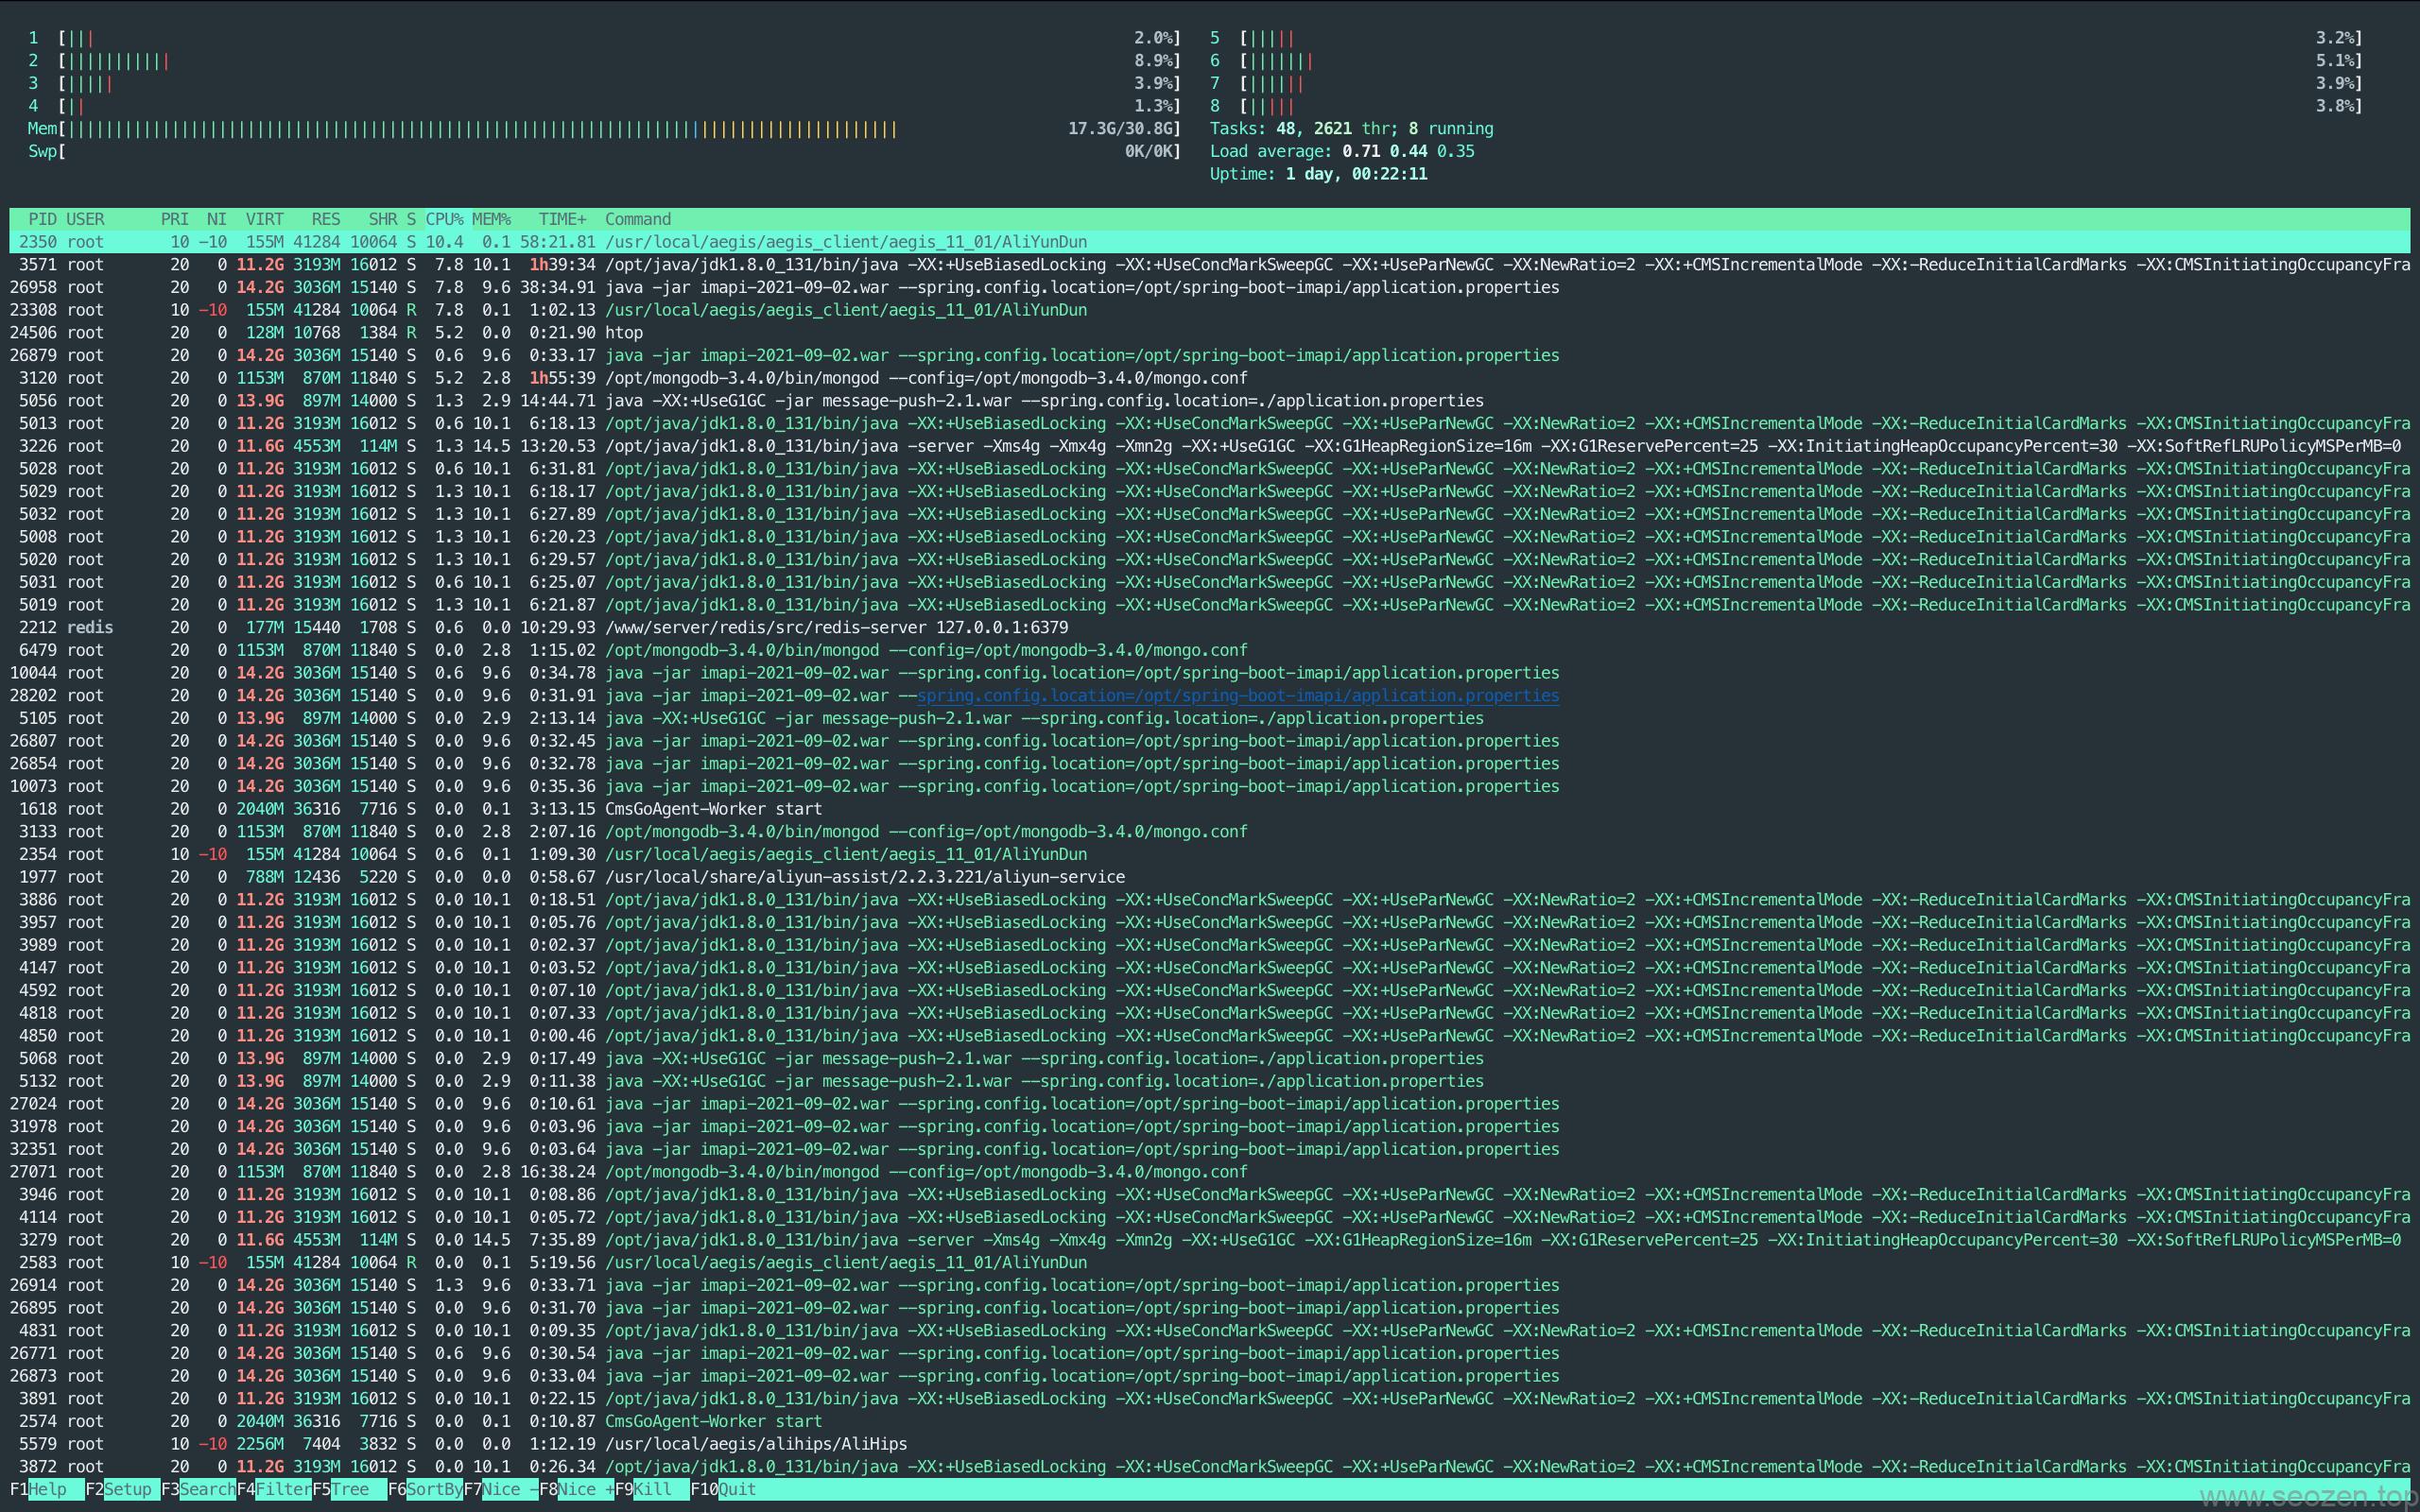 linux-learning-htop-app